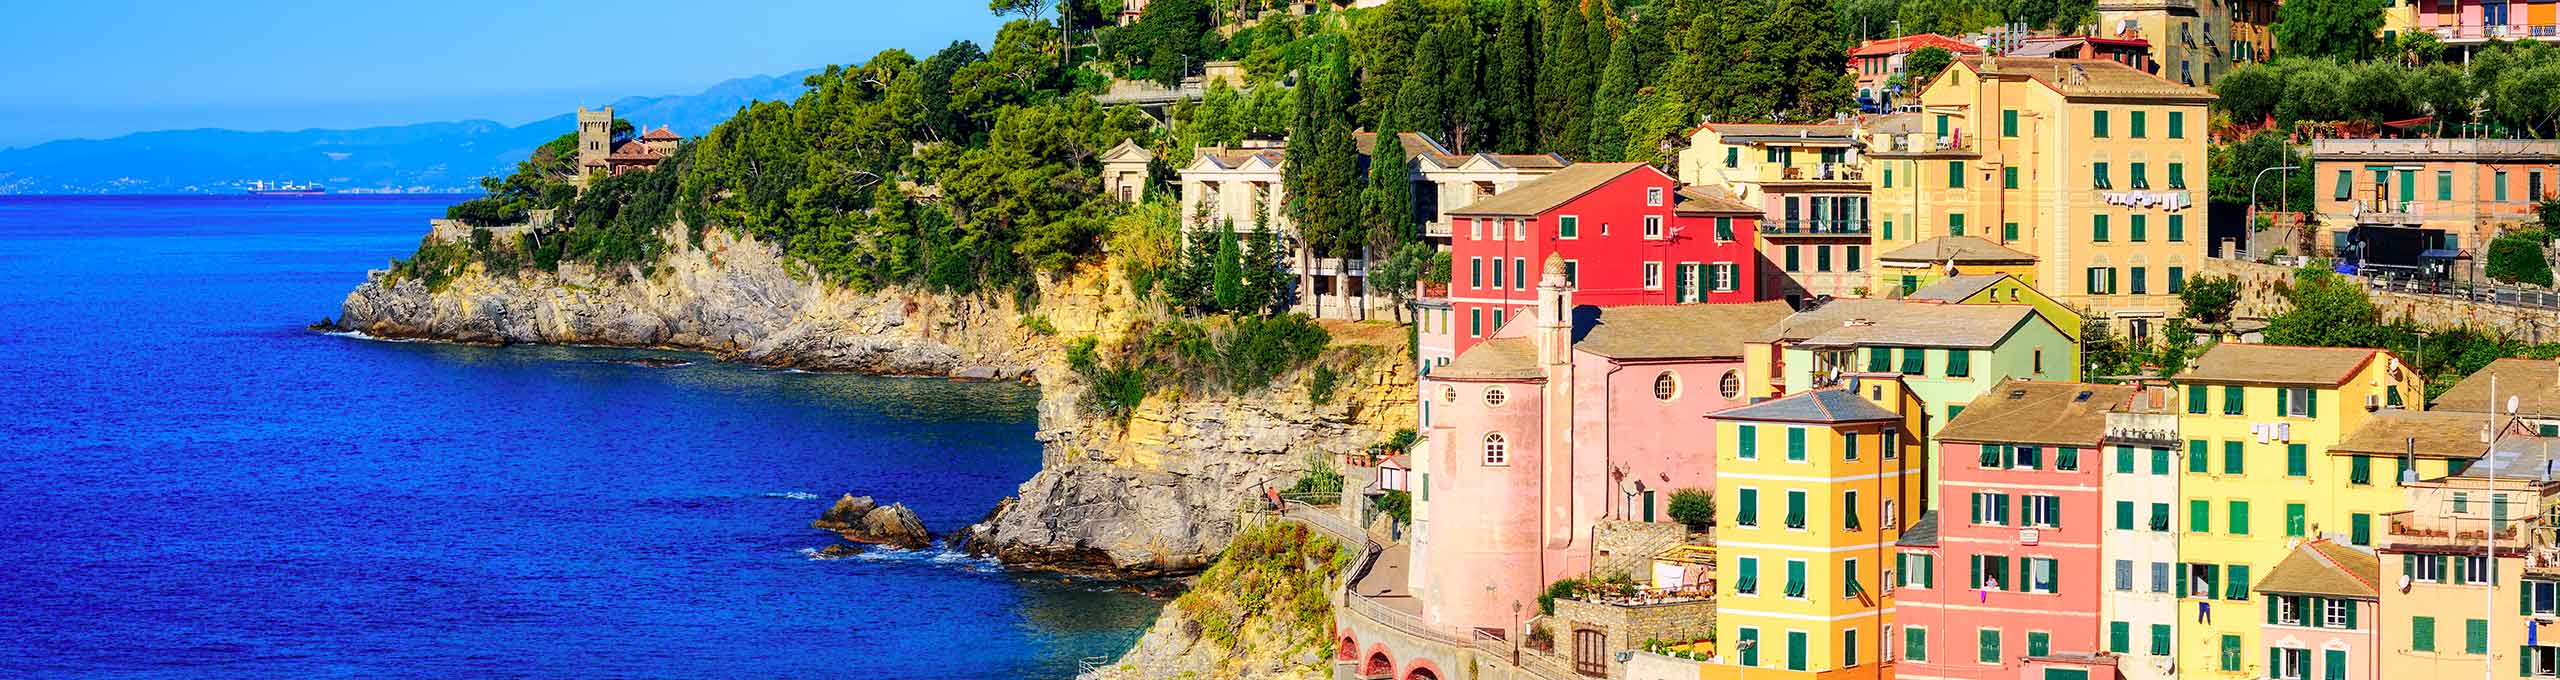 Sori, Golfo Paradiso, Liguria